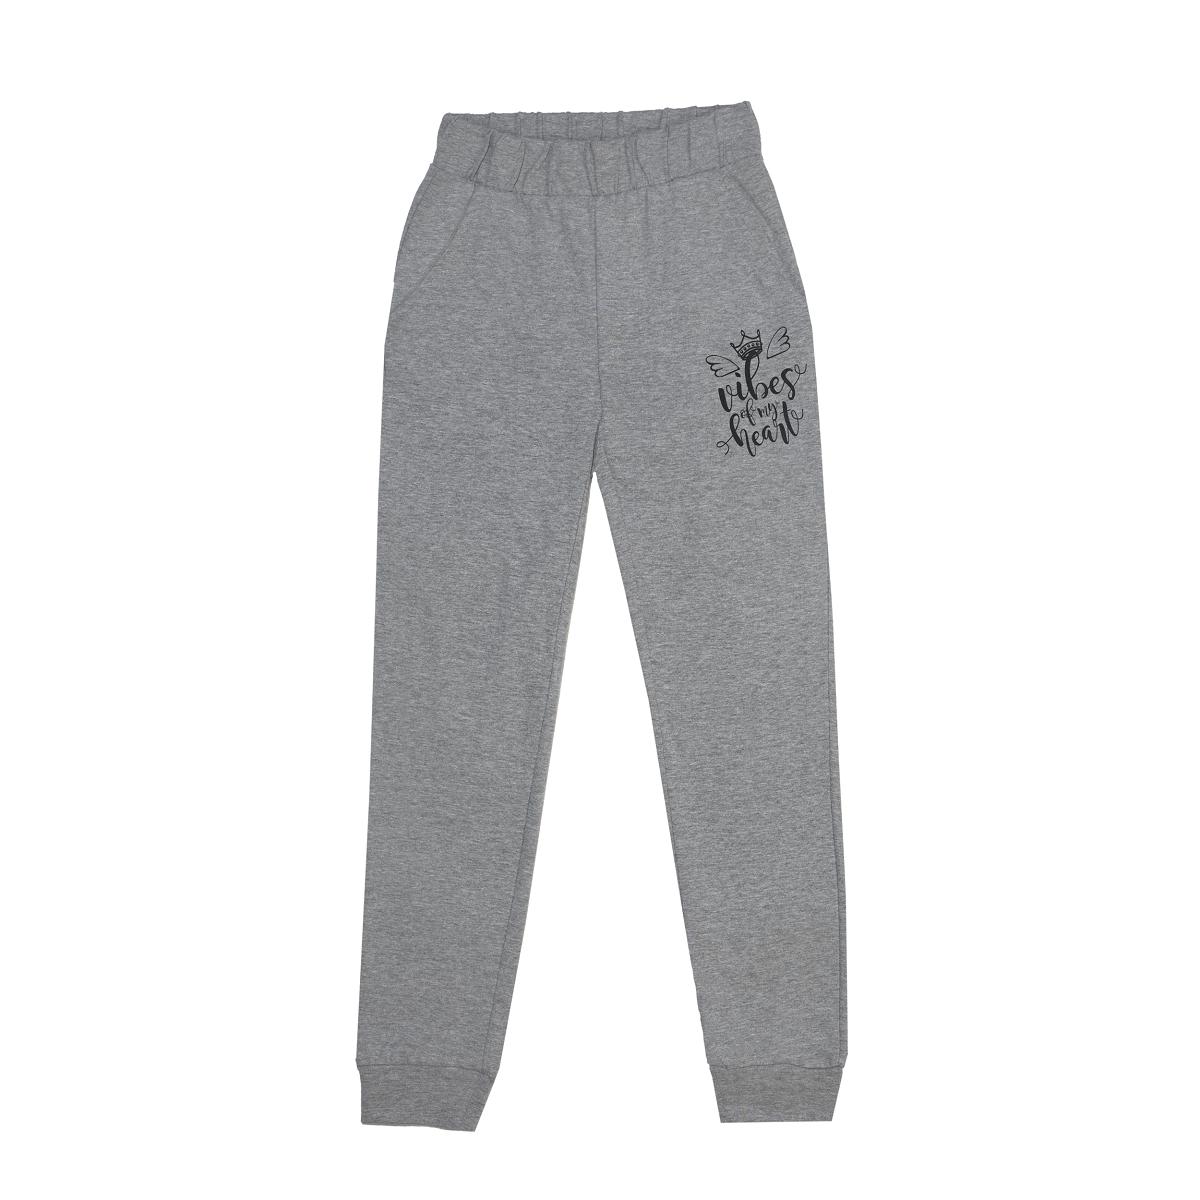 Dekliške hlače, melange siva